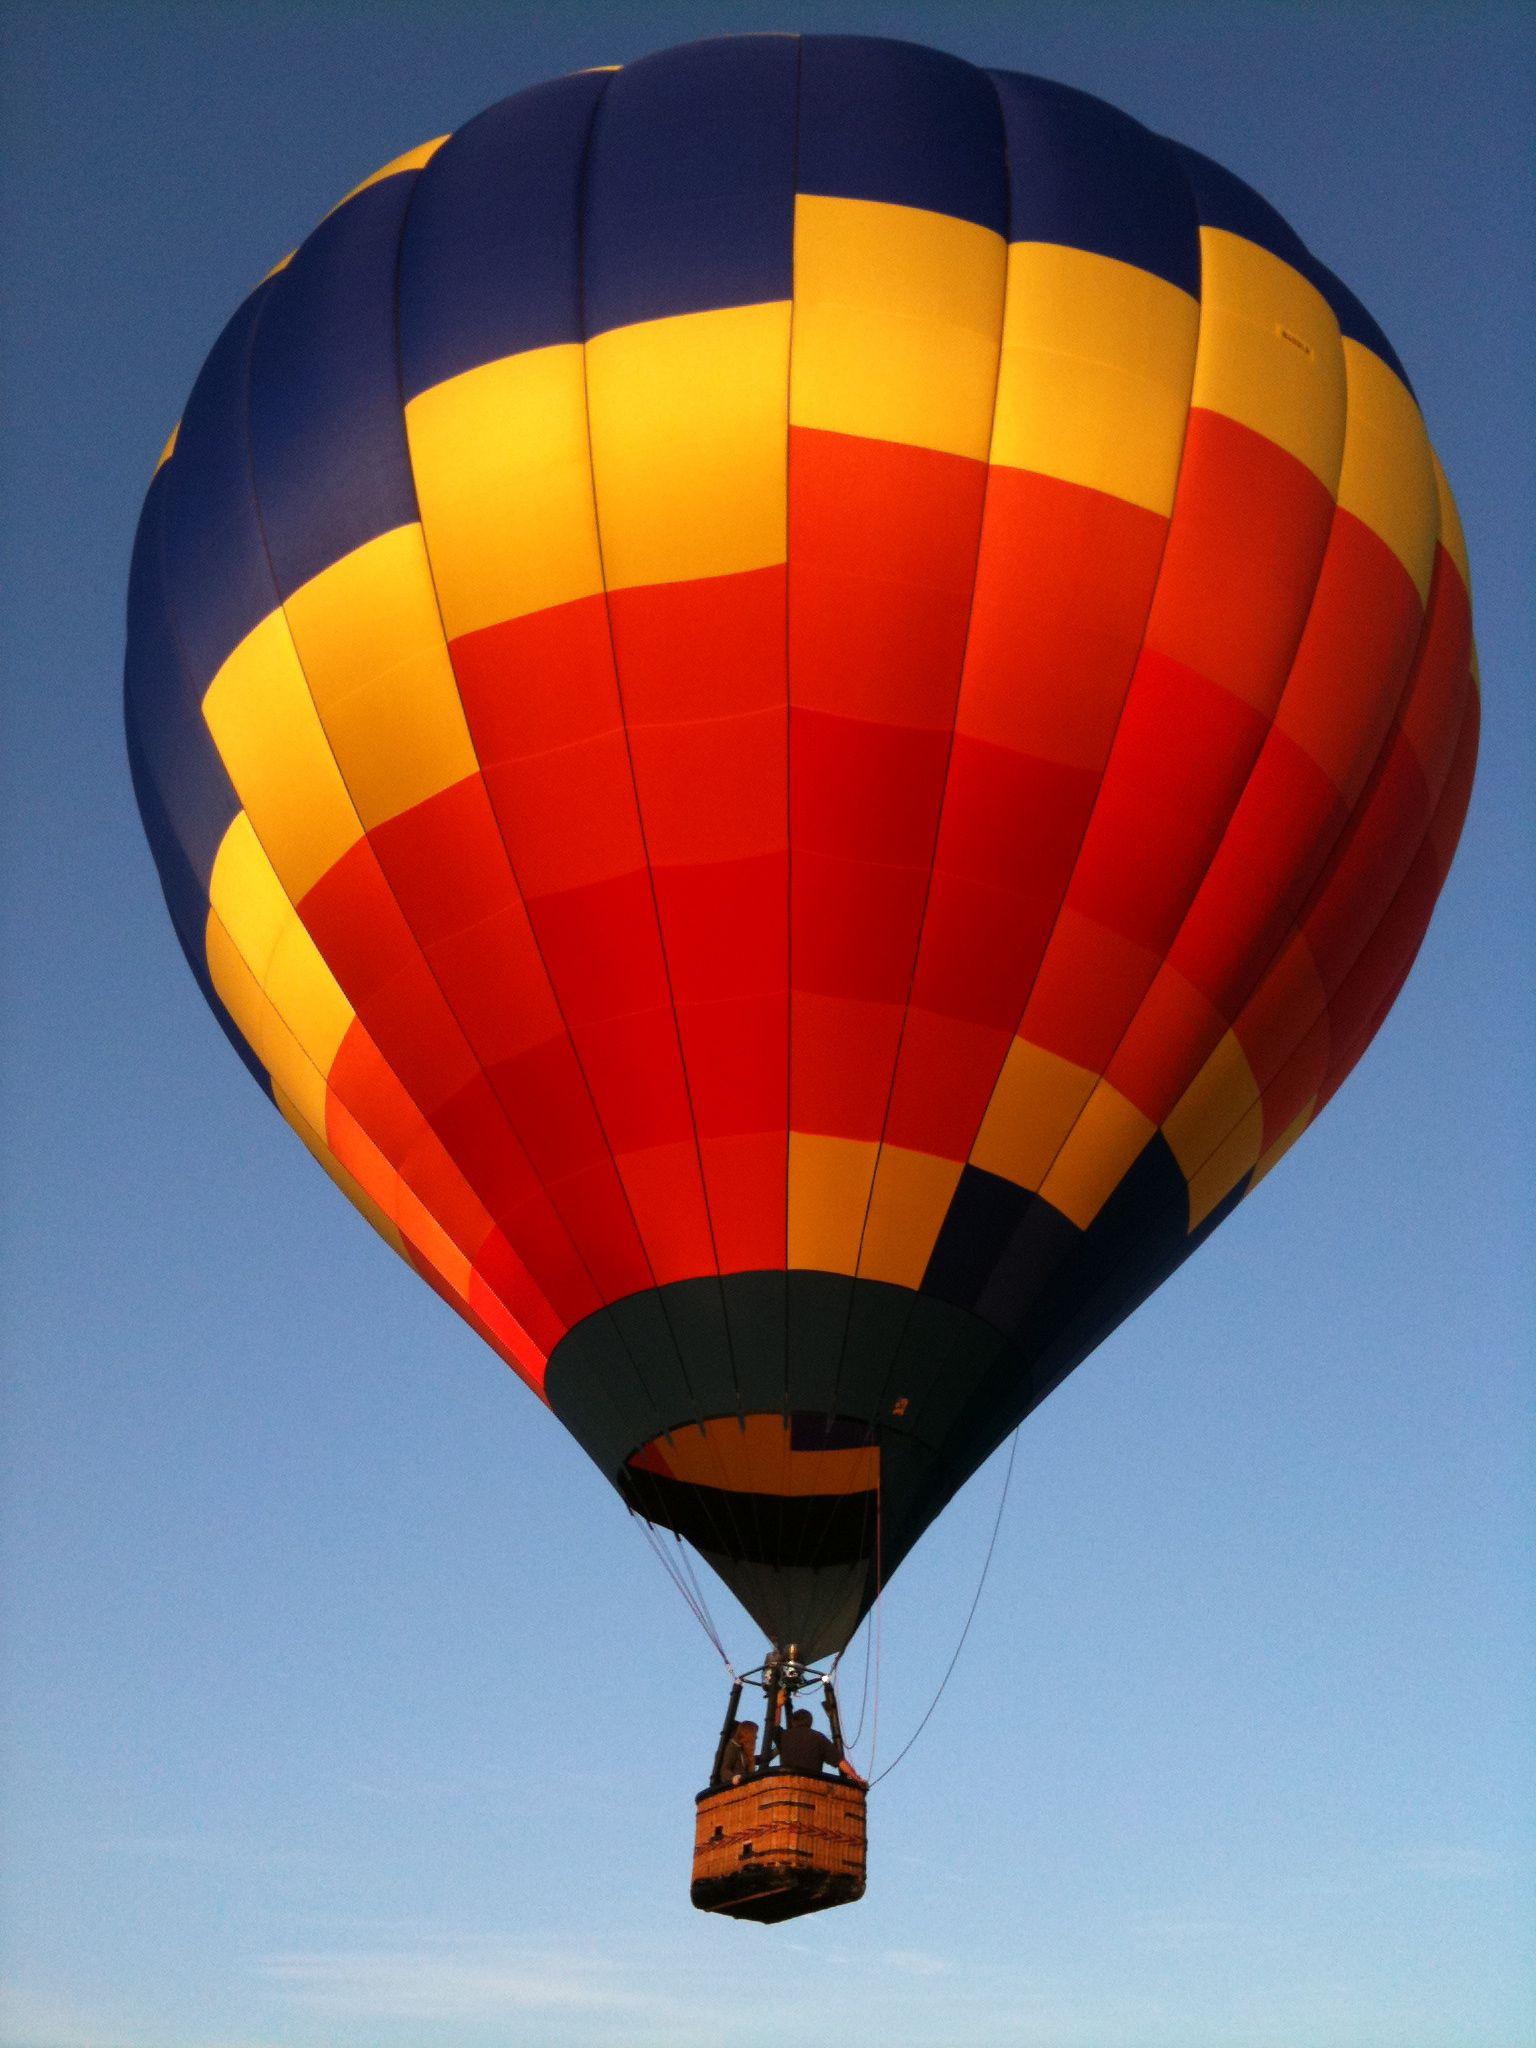 How hot air balloons work howstuffworks, Hot air